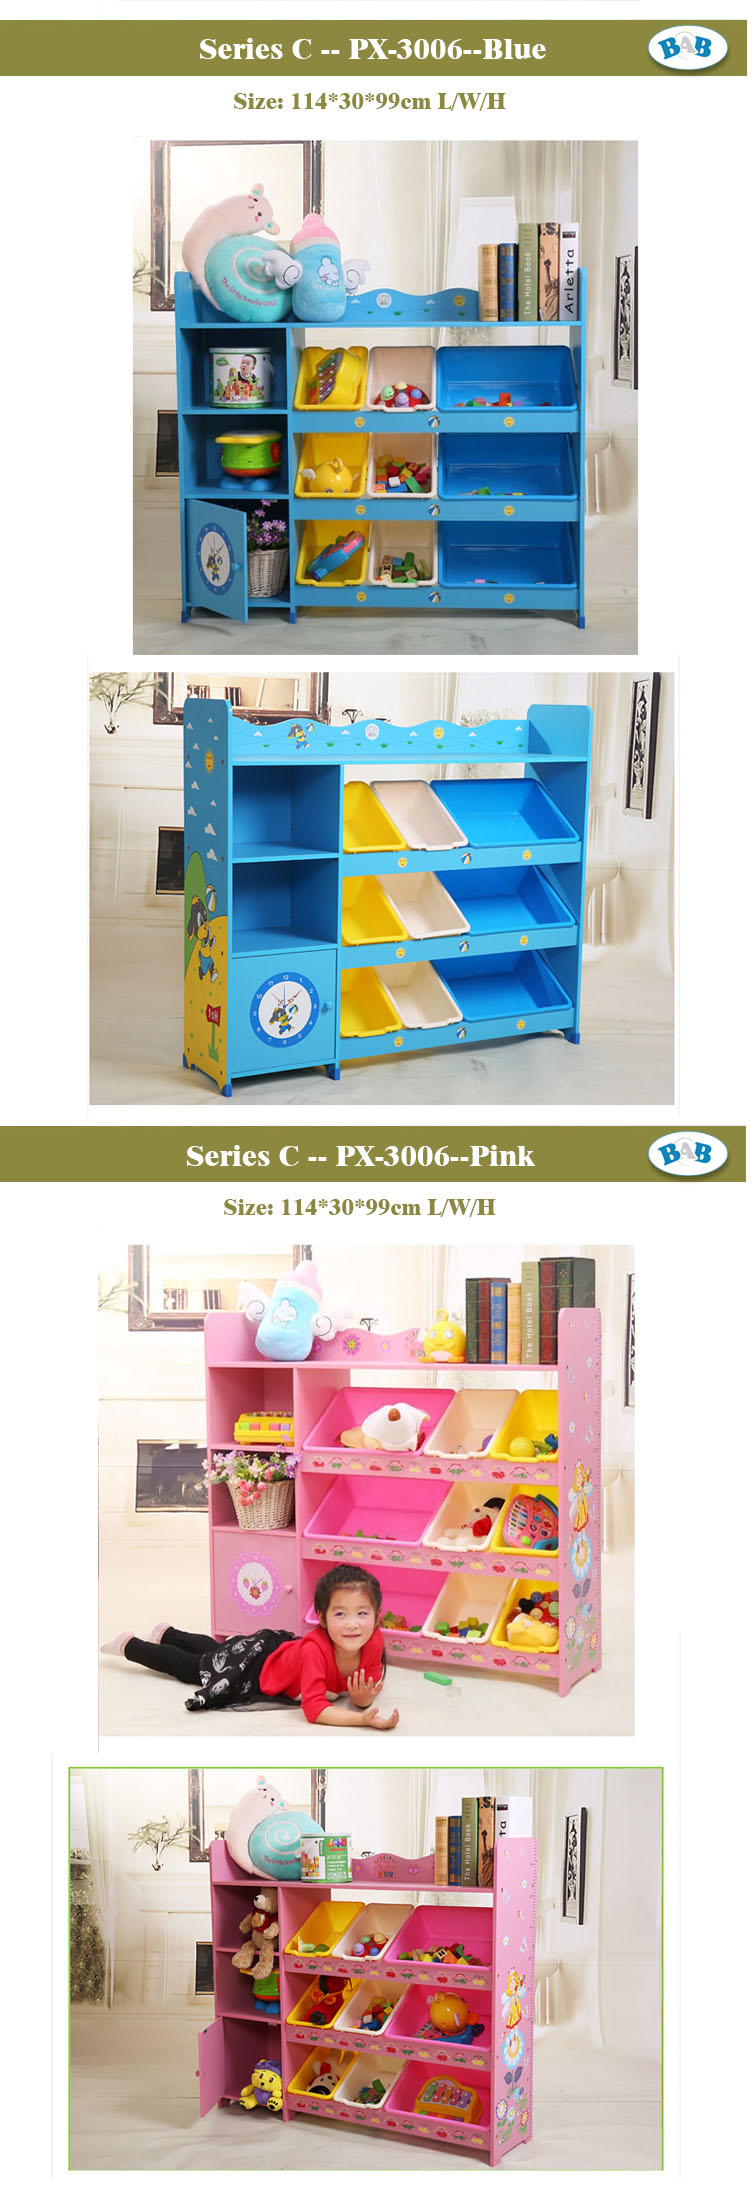 Buy price adjusted daily toy storage shelf book shelf for Cheap book storage